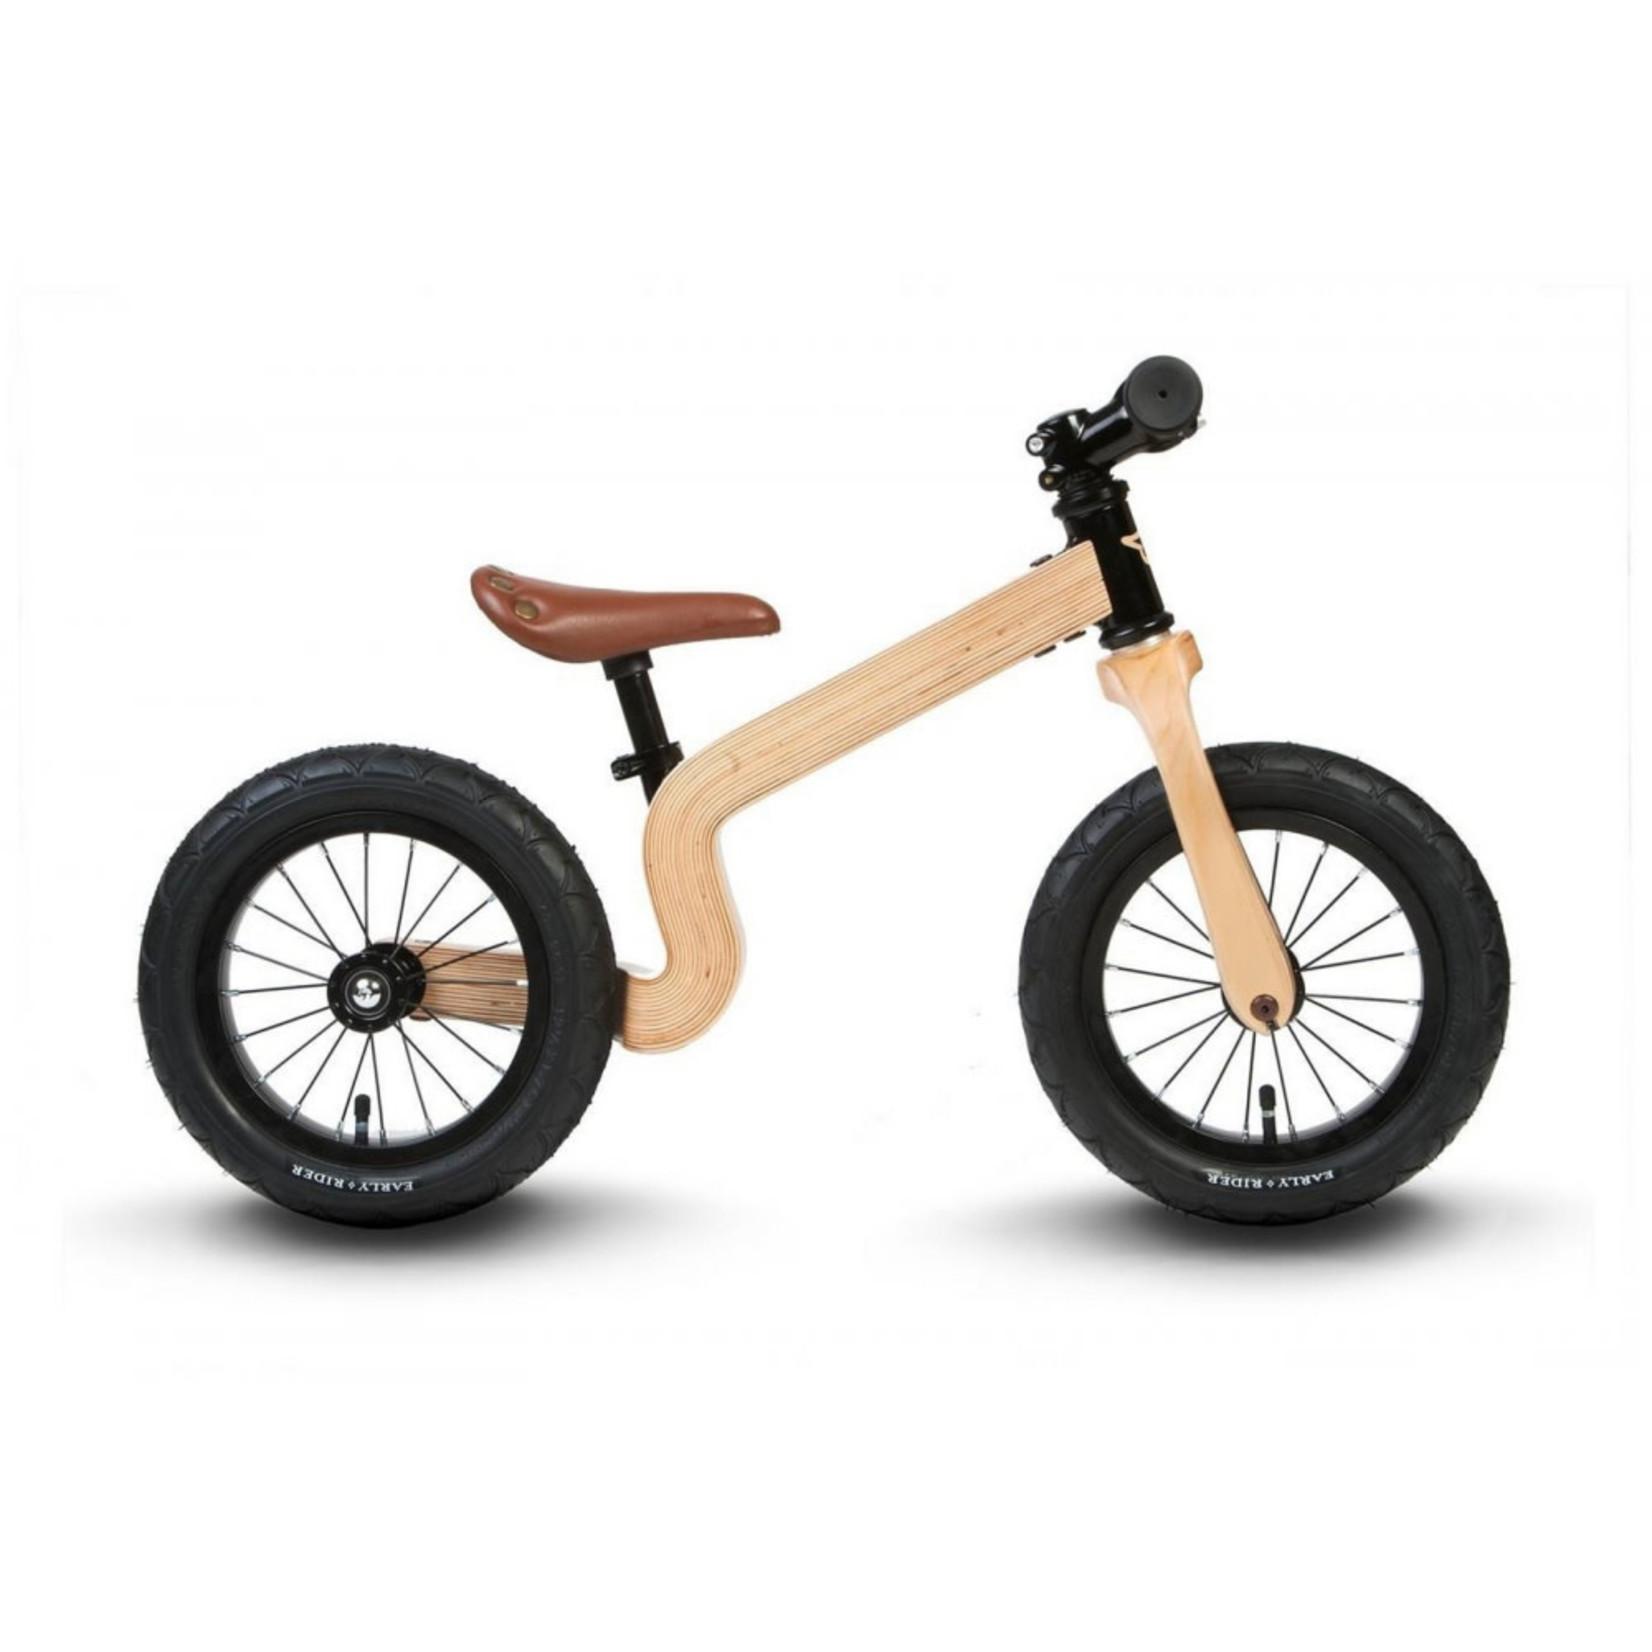 Early Rider EARLY RIDER - Bonsai - Wood da 1.5 a 3.5 anni